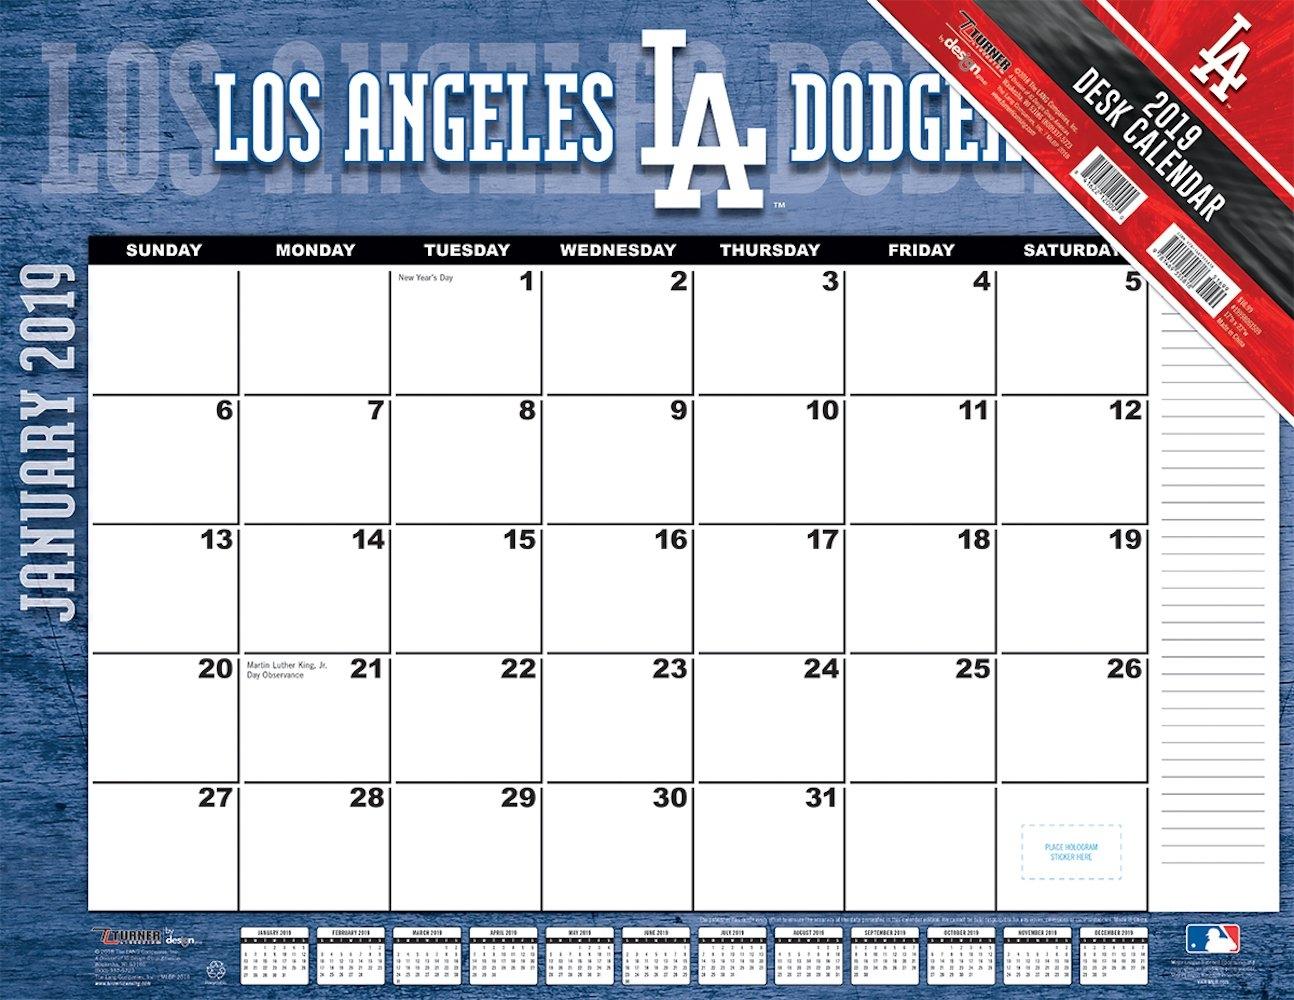 Los Angeles Dodgers 2019 Mlb 22 X 17 Desk Calendar – Buy At Khc Sports Calendar 2019 To Buy